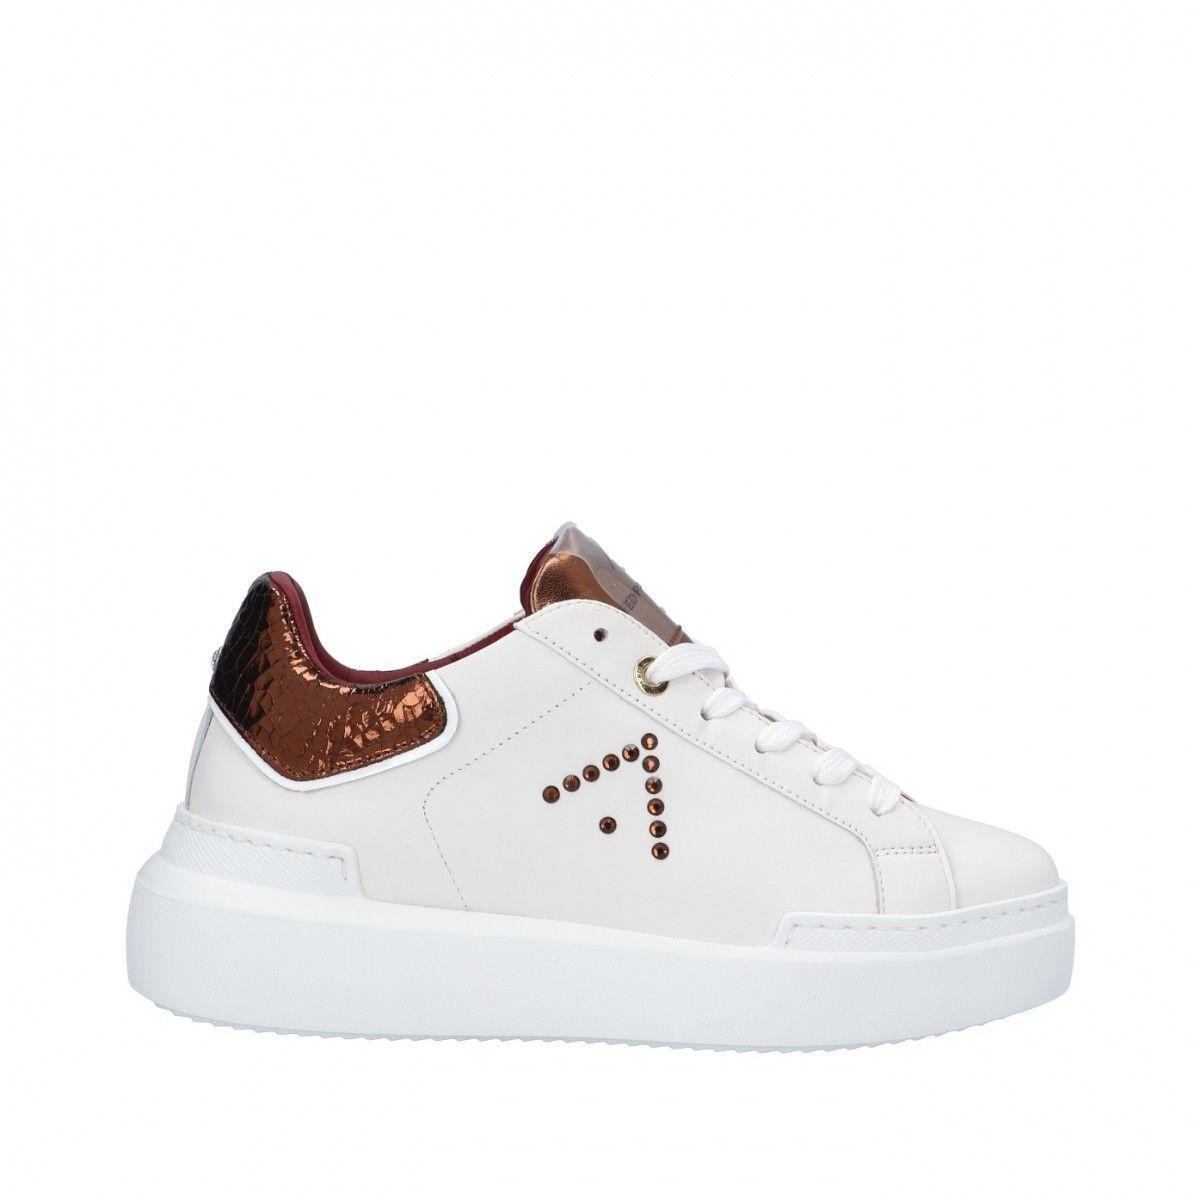 Ed parrish Sneaker Bianco/bronzo Gomma CKLD-SW31